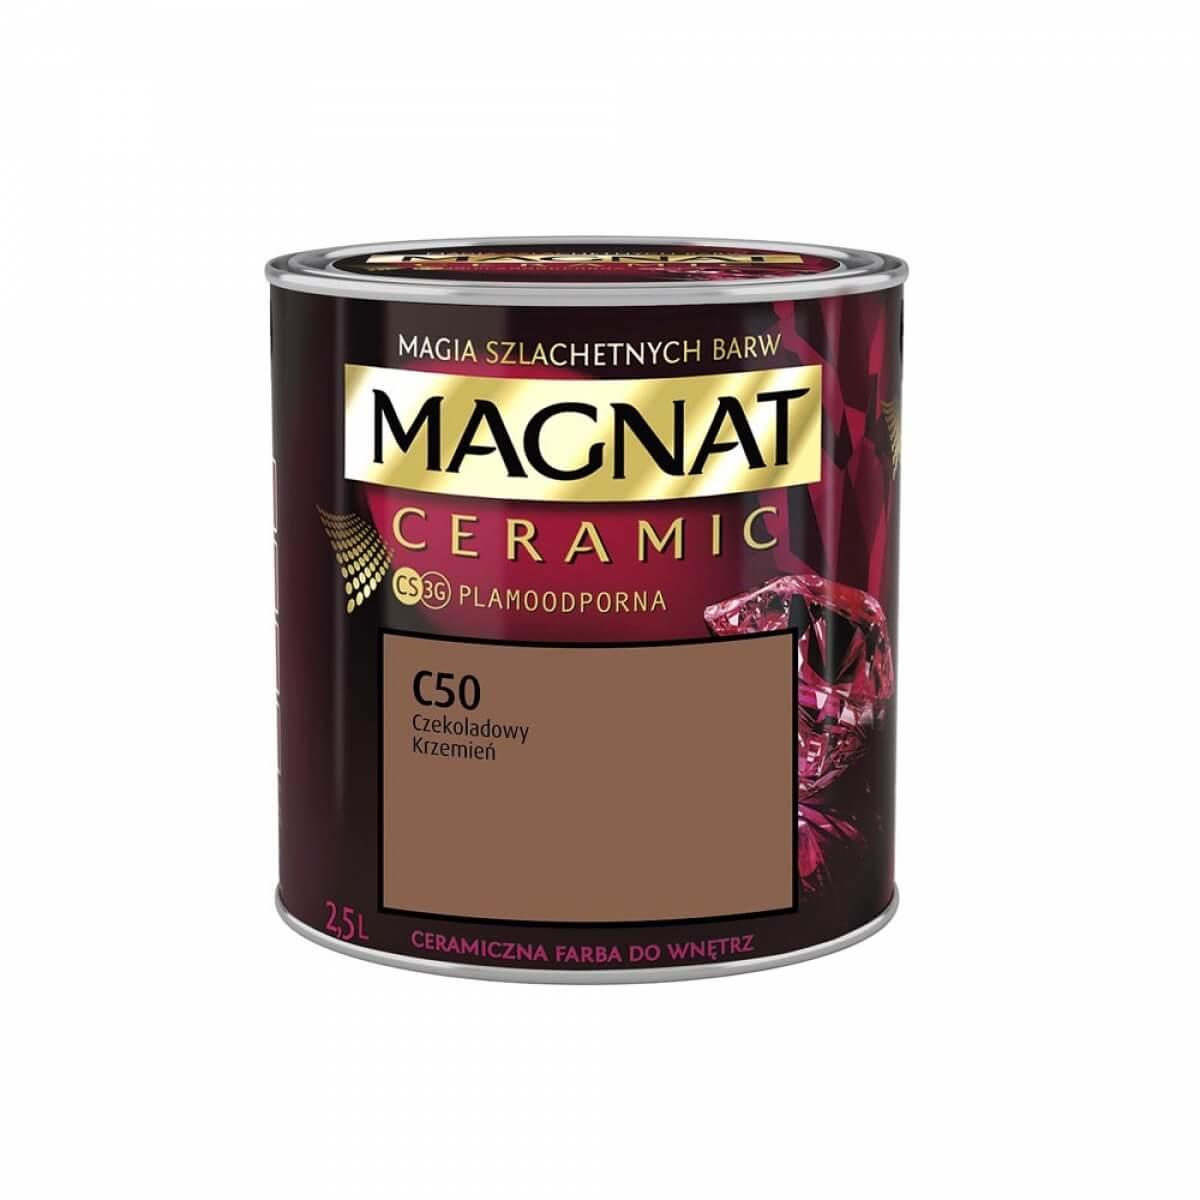 Magnat Ceramic Ceramiczna Farba Do Wnętrz 25l Lub 5l śnieżka